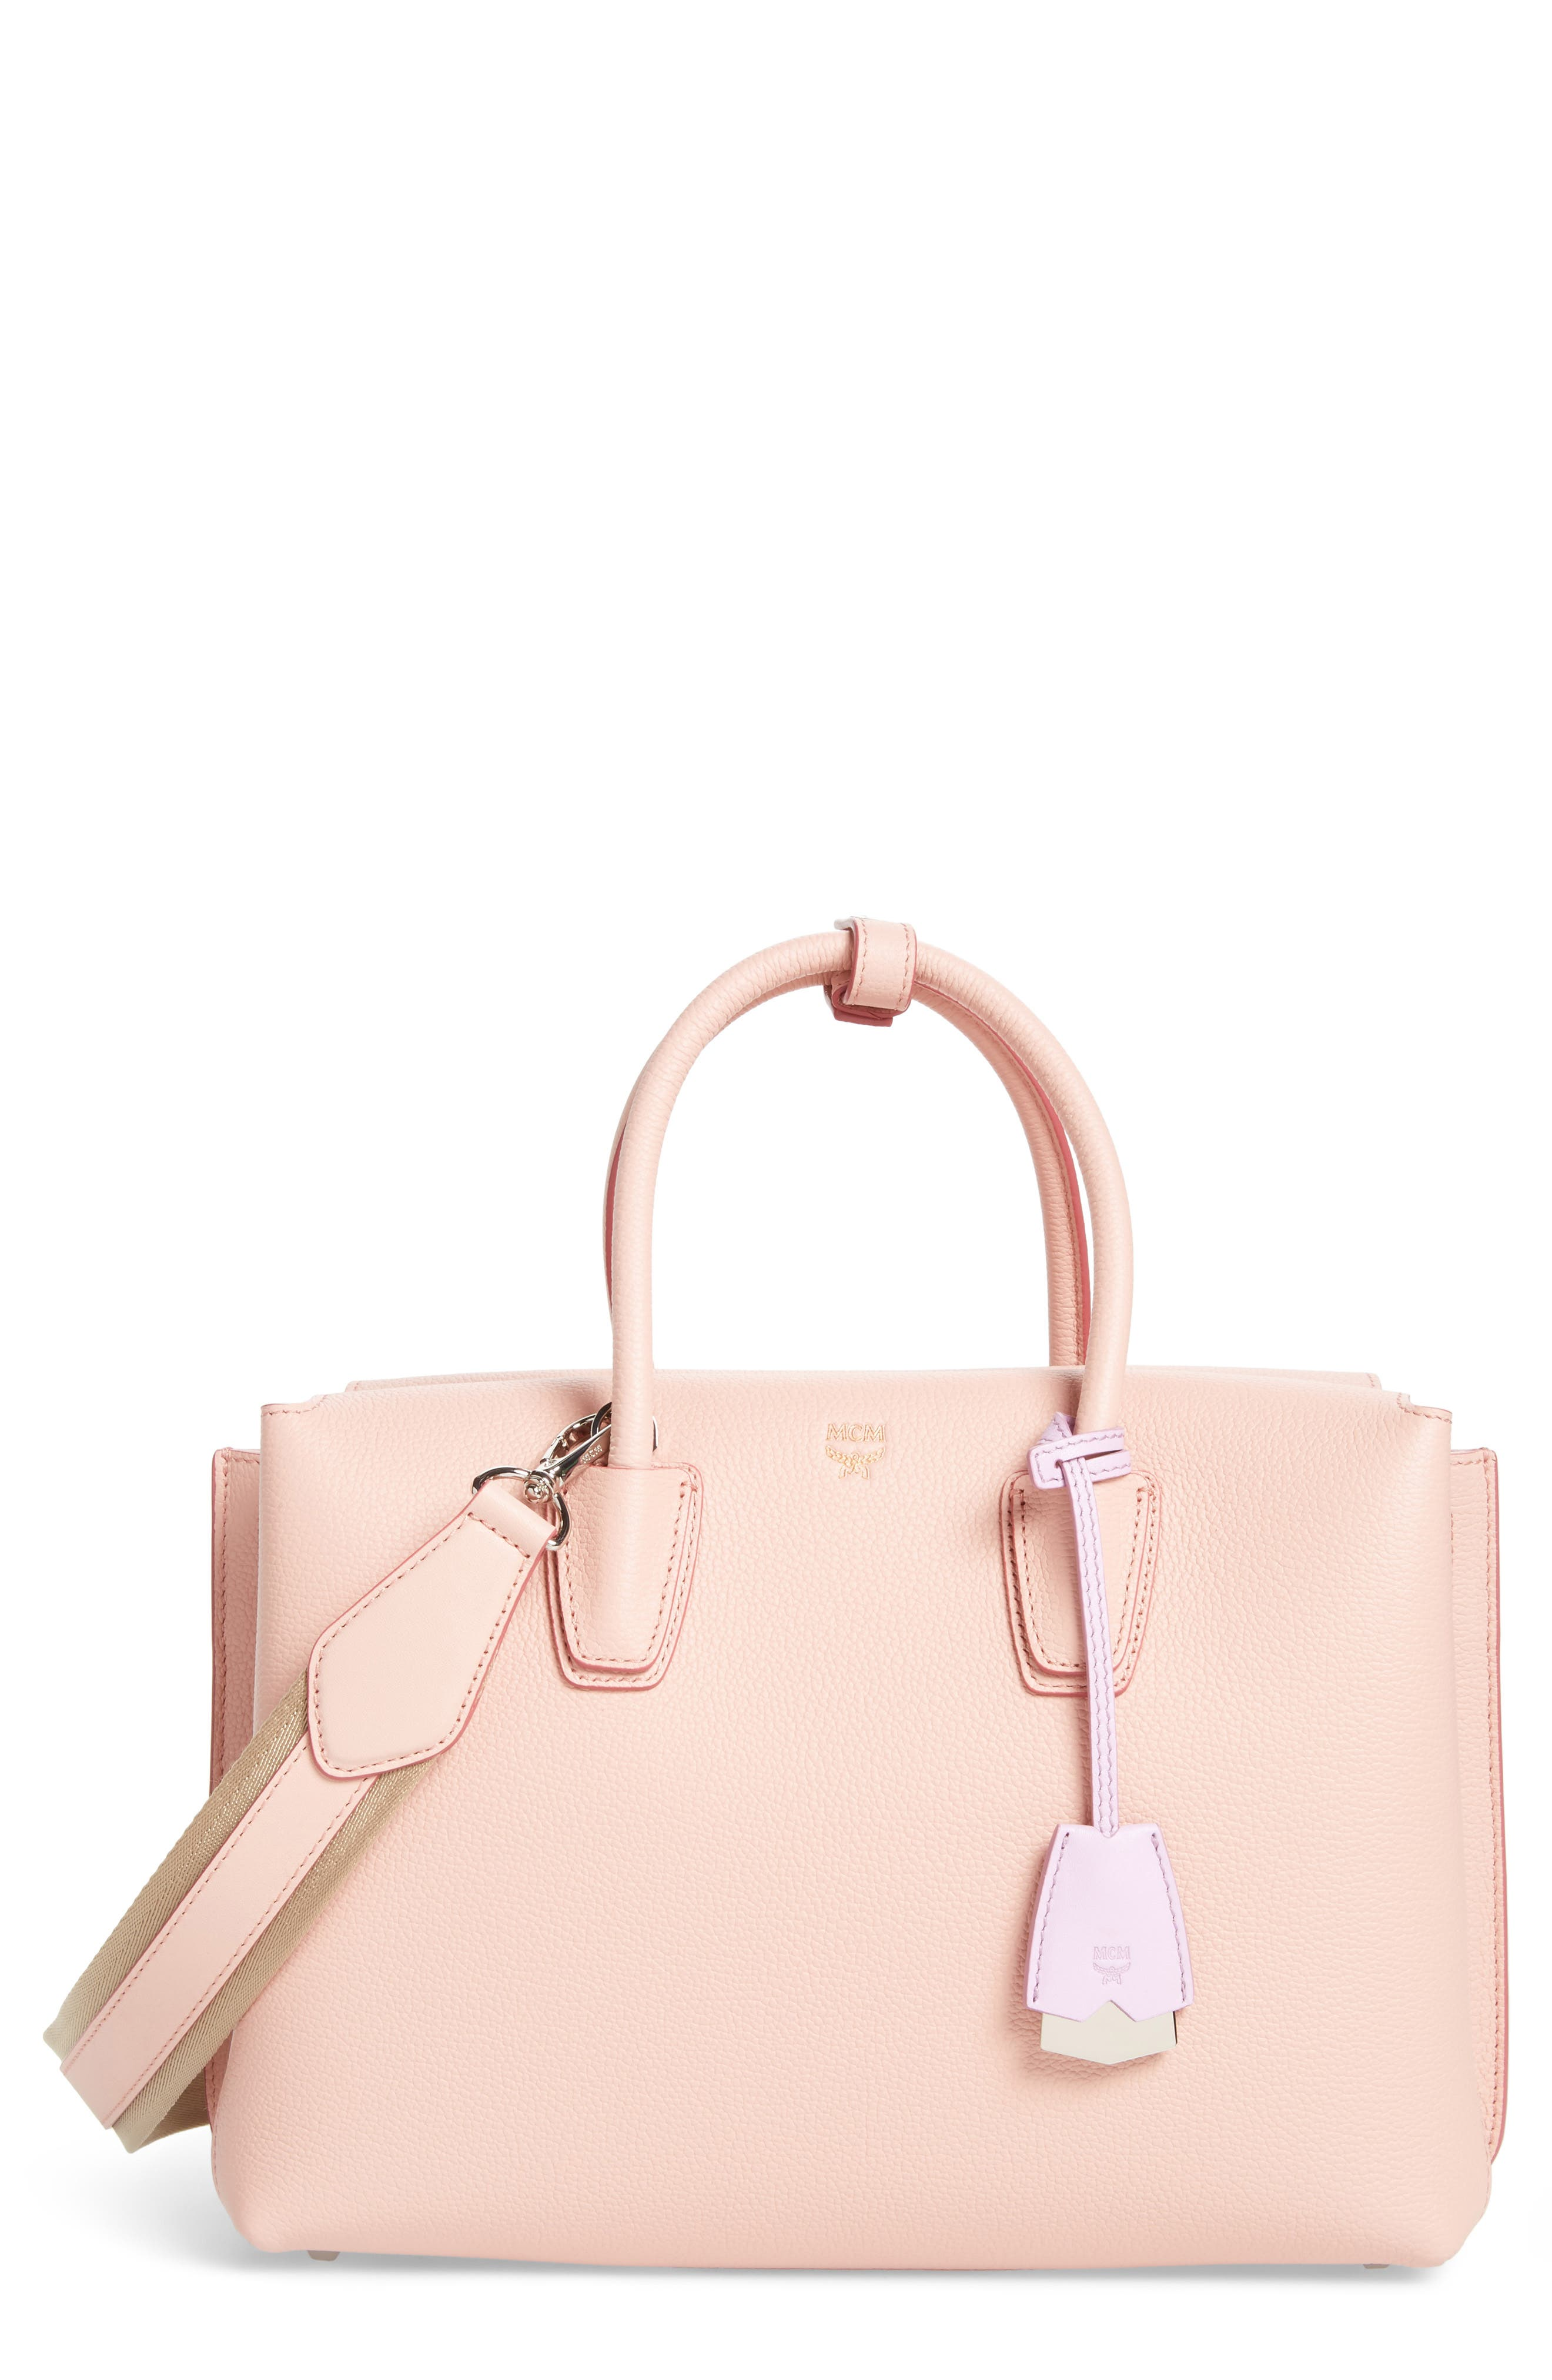 Medium Milla Leather Tote,                             Main thumbnail 1, color,                             Pink Blush